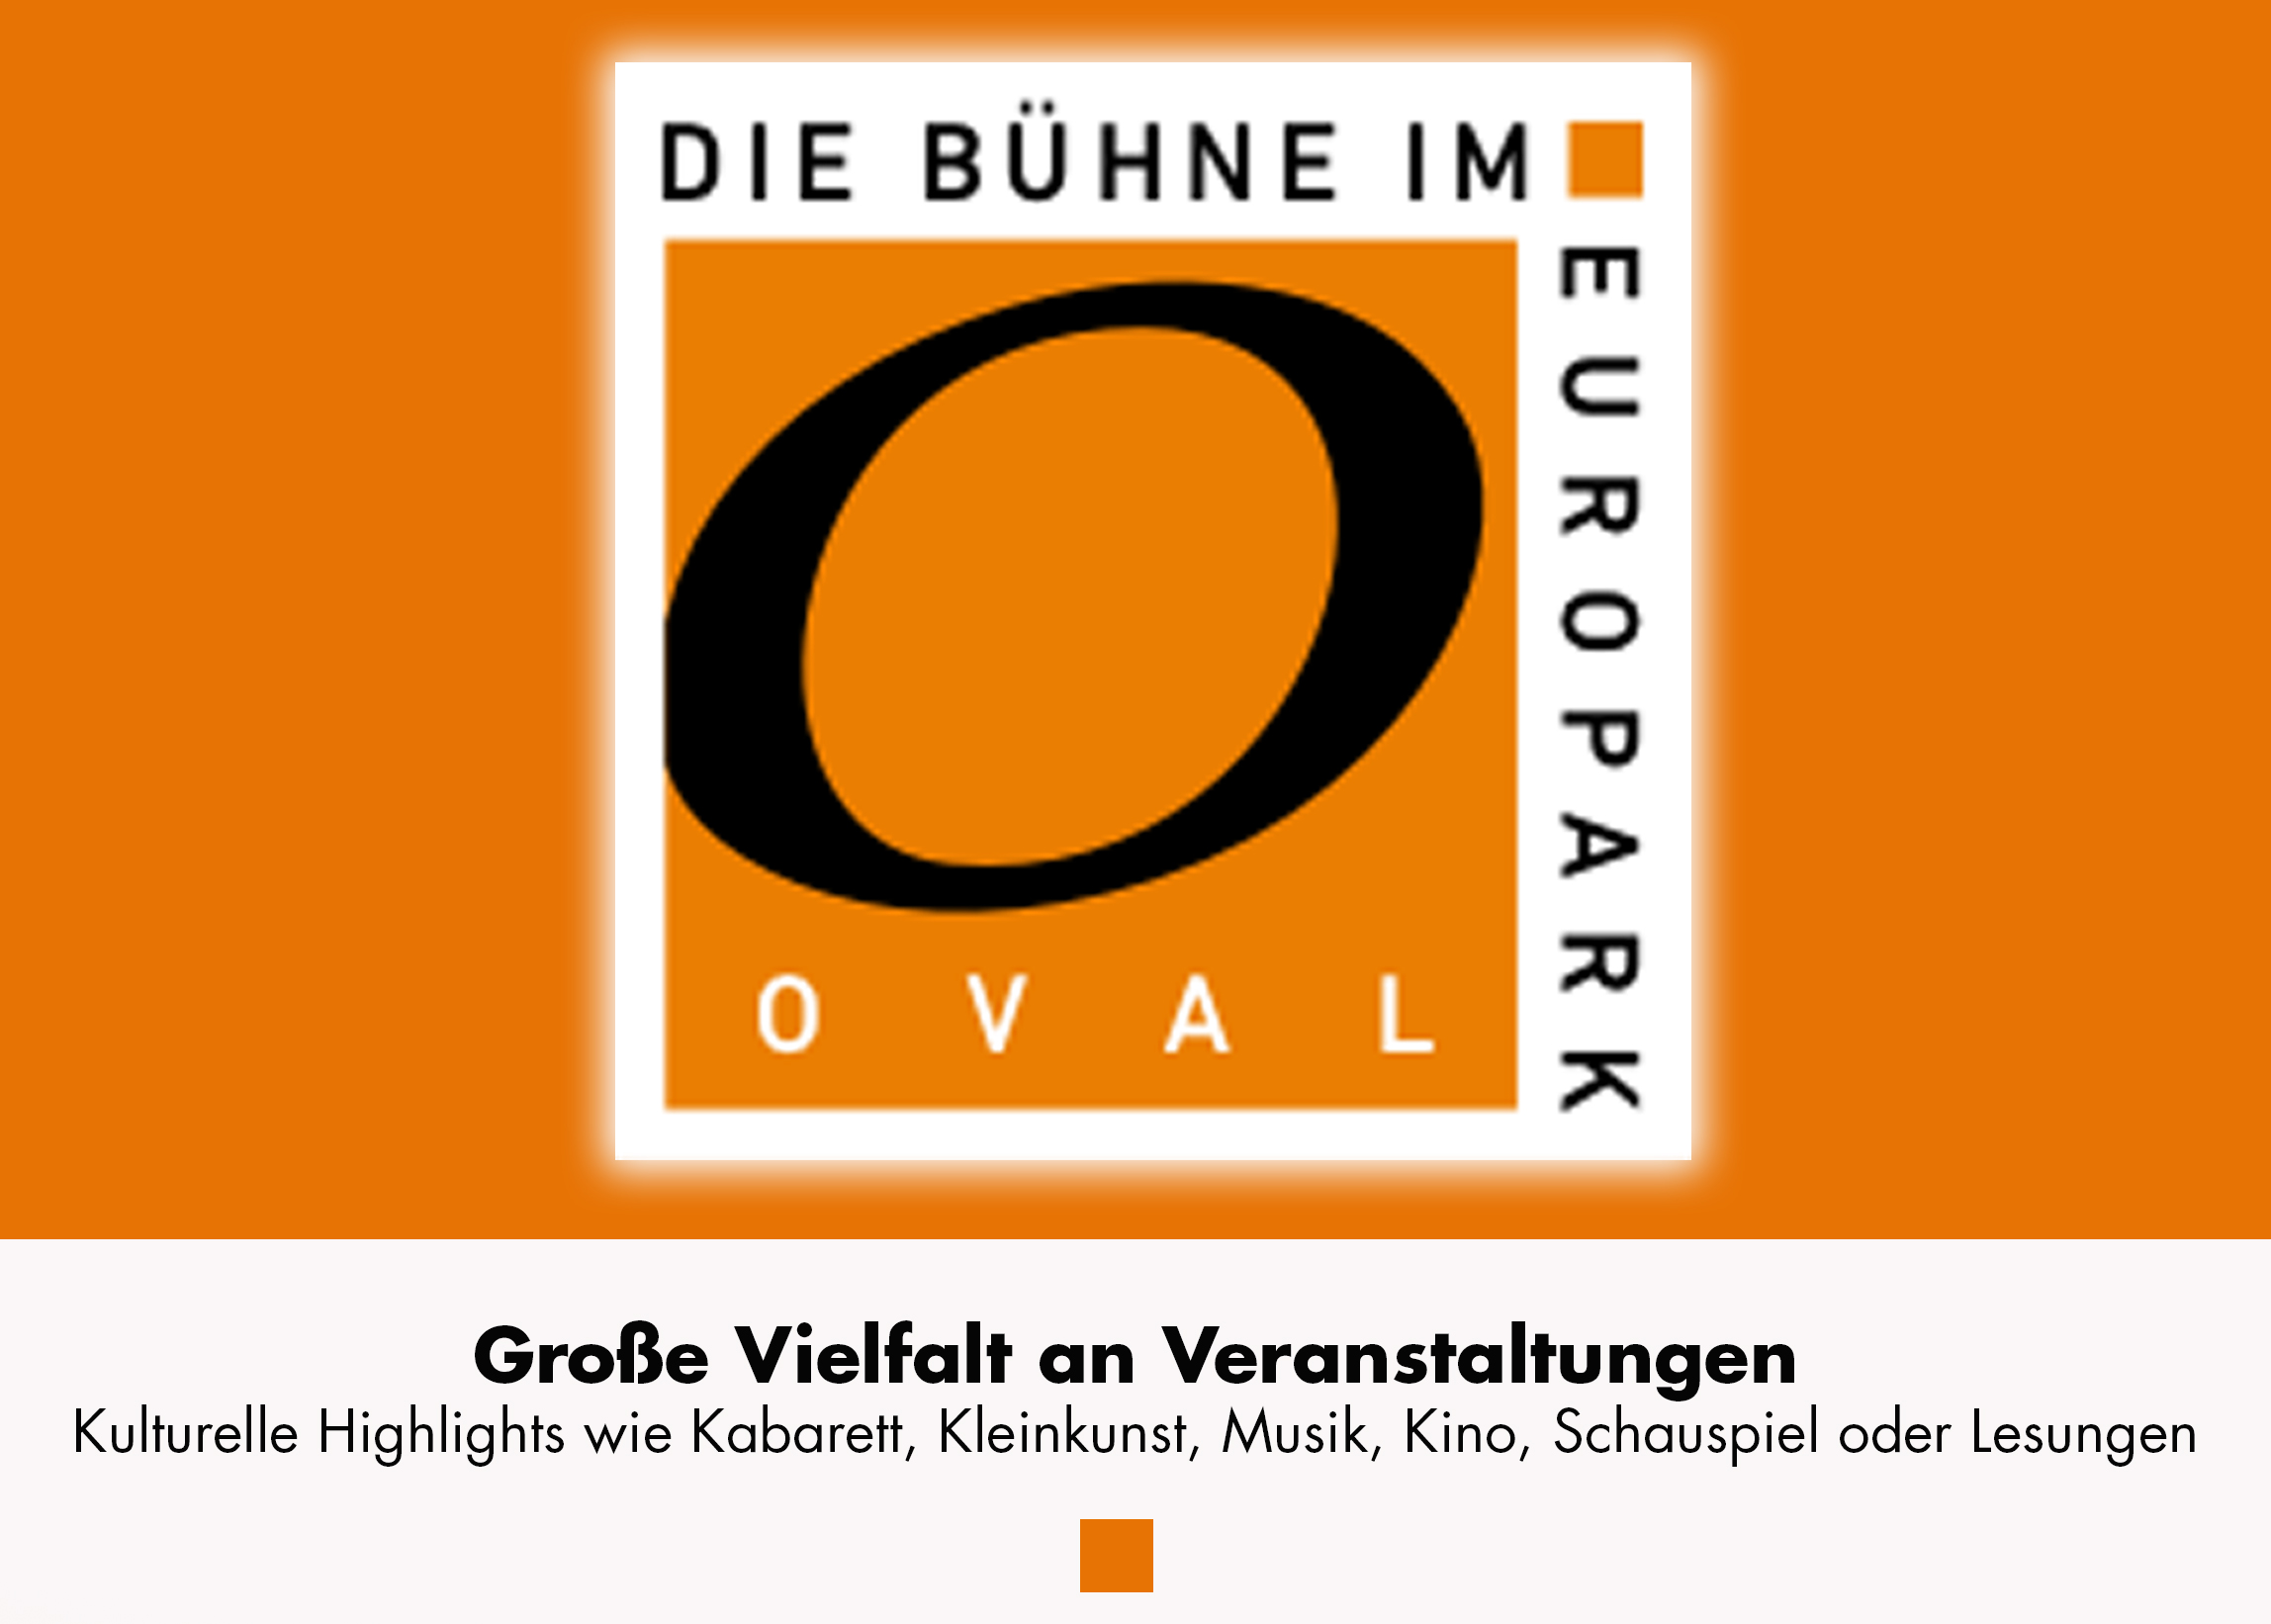 Salzburg-Cityguide - Event - OK_OVAL_Europark_SA_Events_551x394